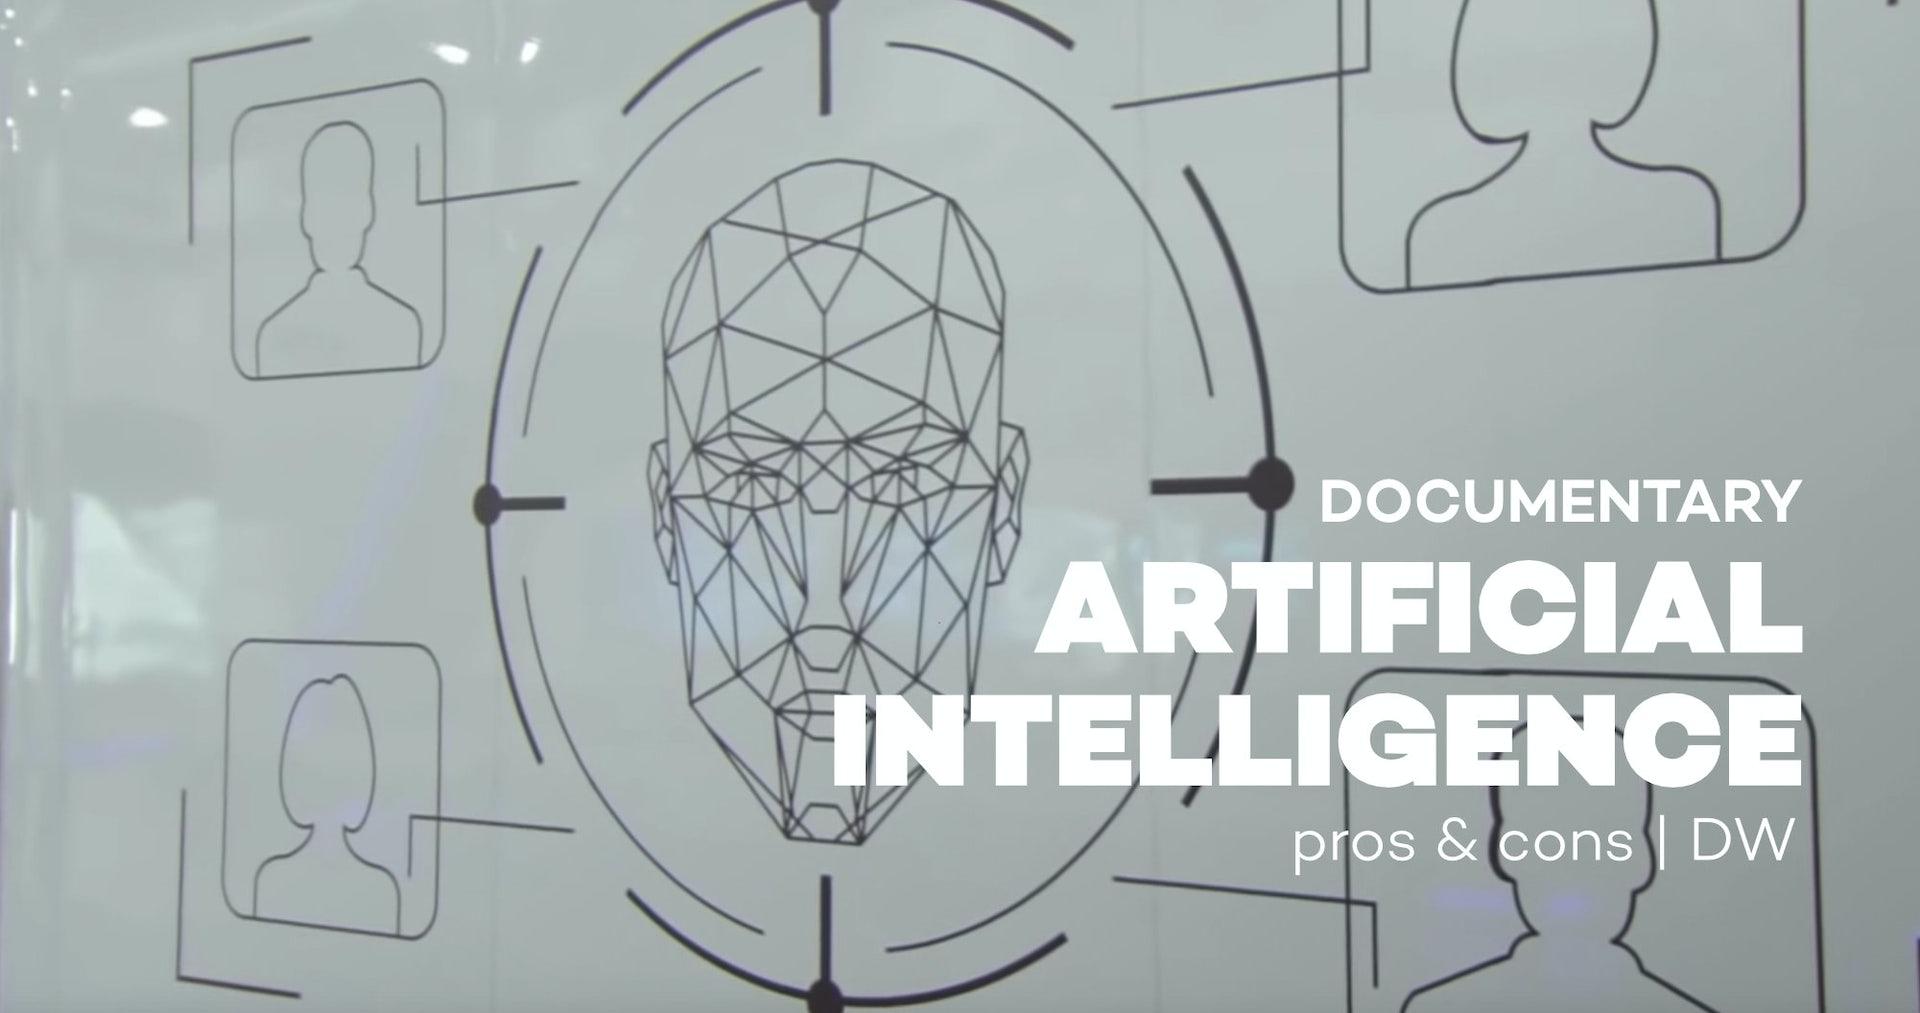 Artificial intelligence & algorithms: pros & cons